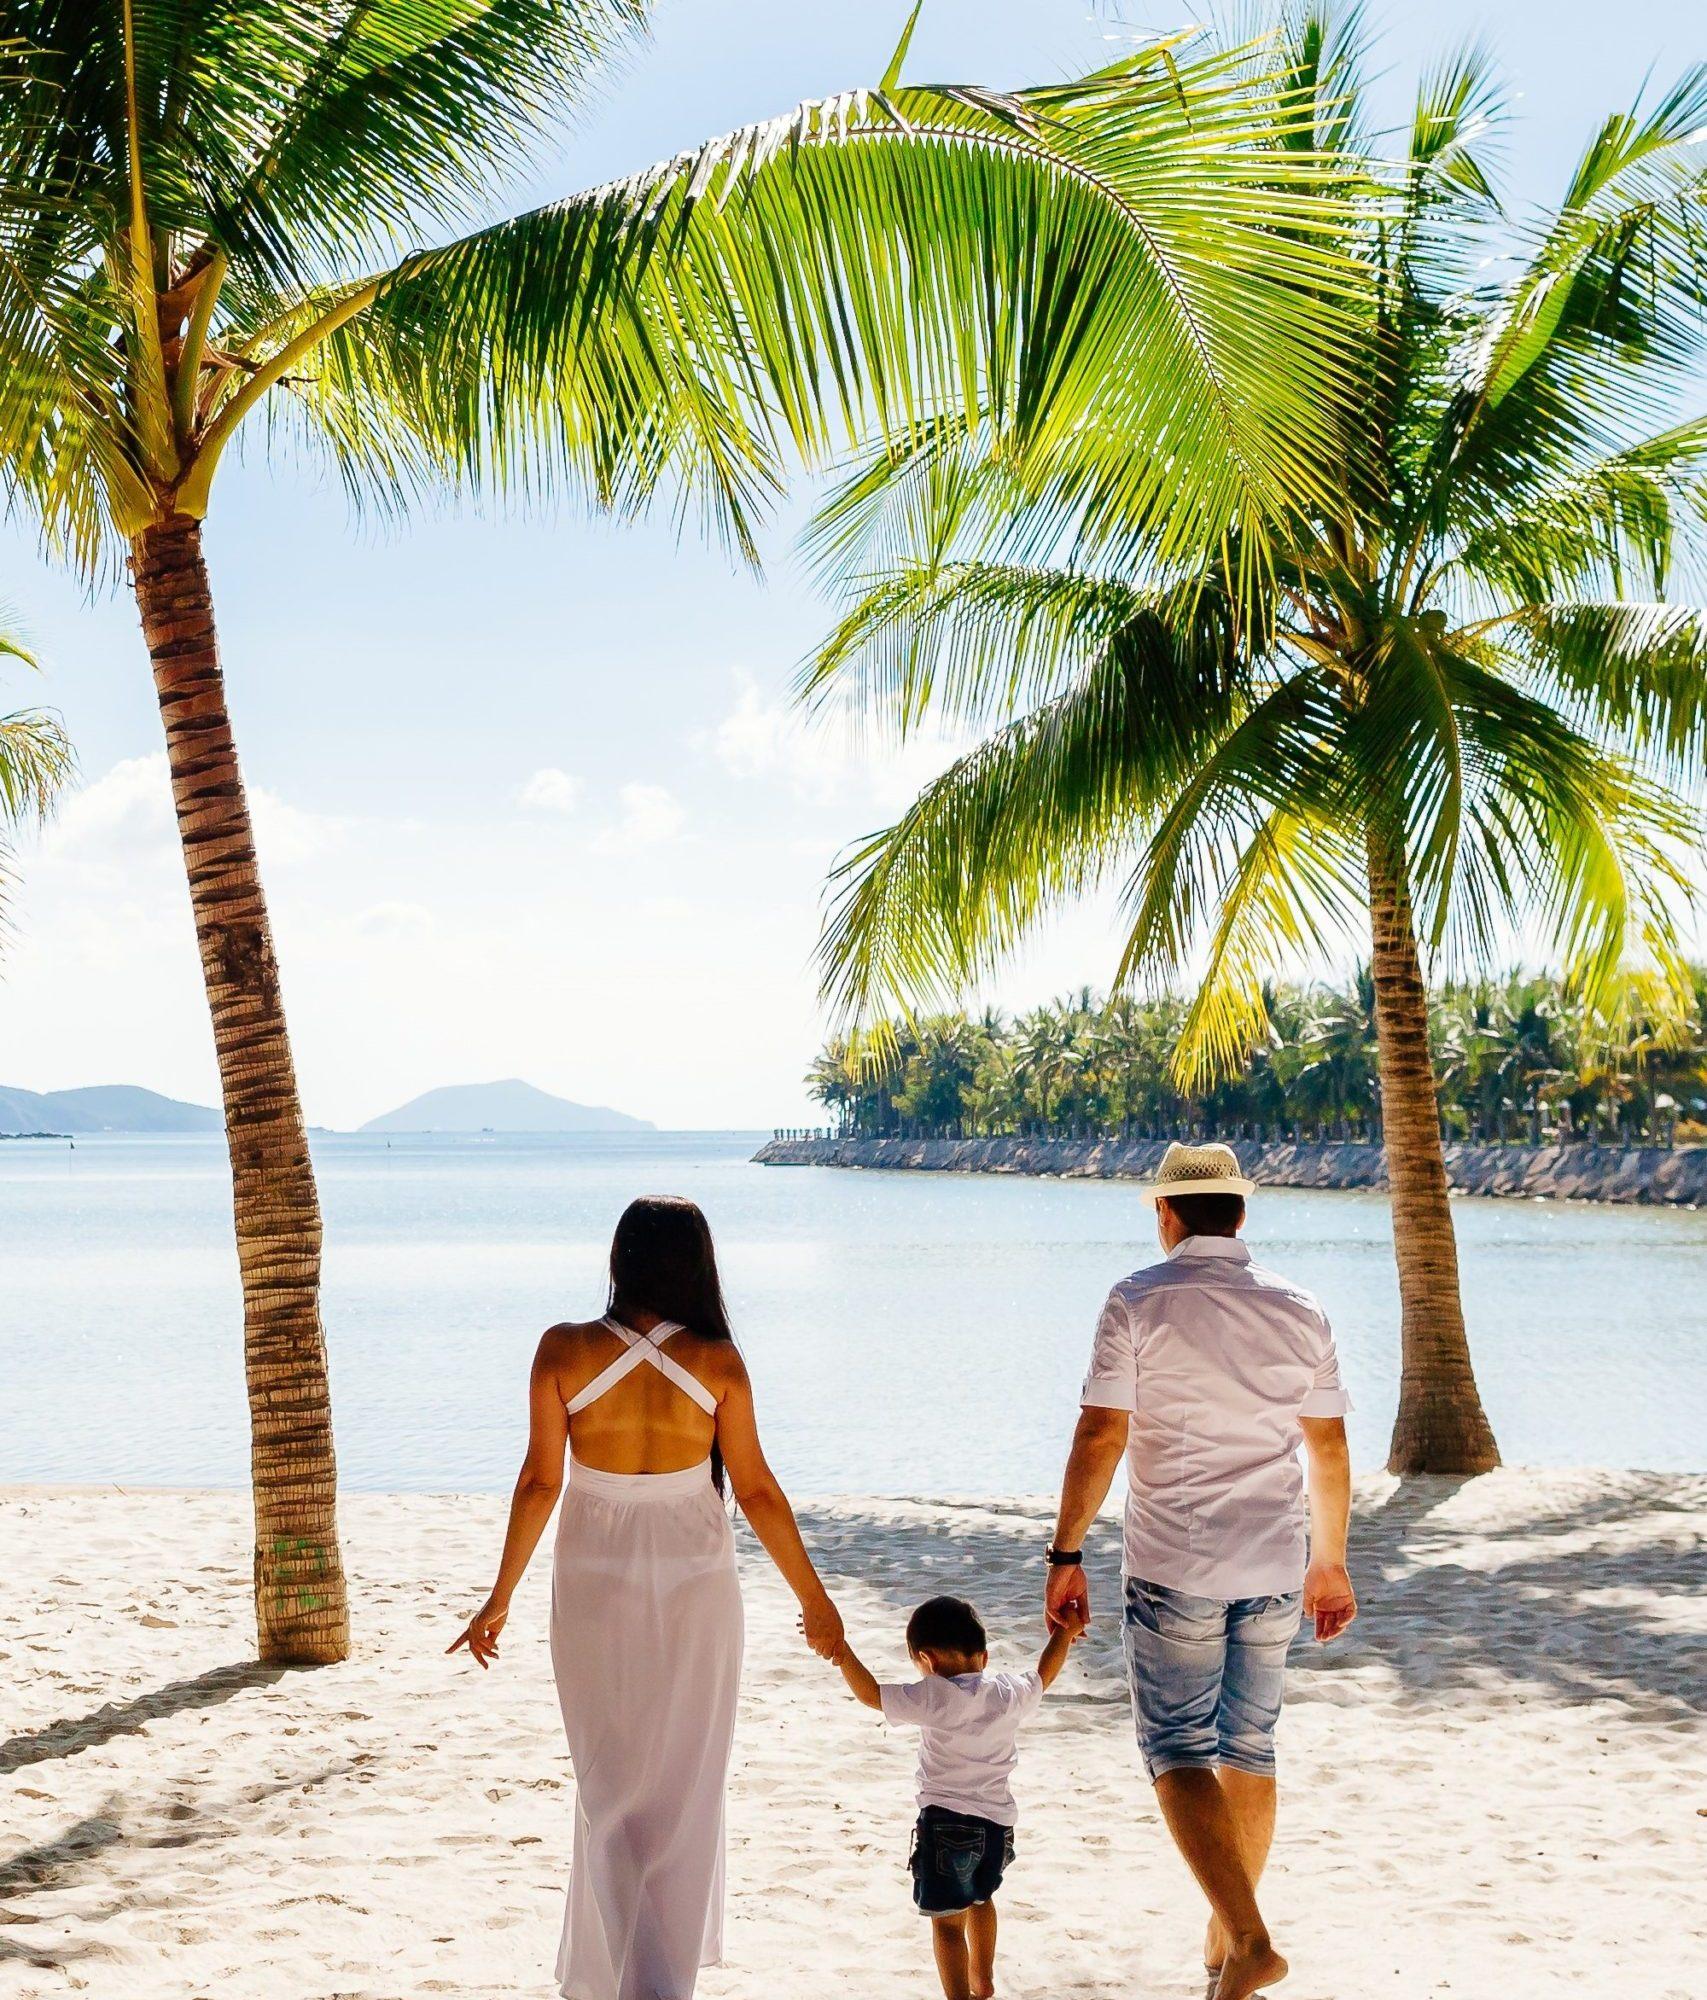 family-vacation-beach-DMWZ58X